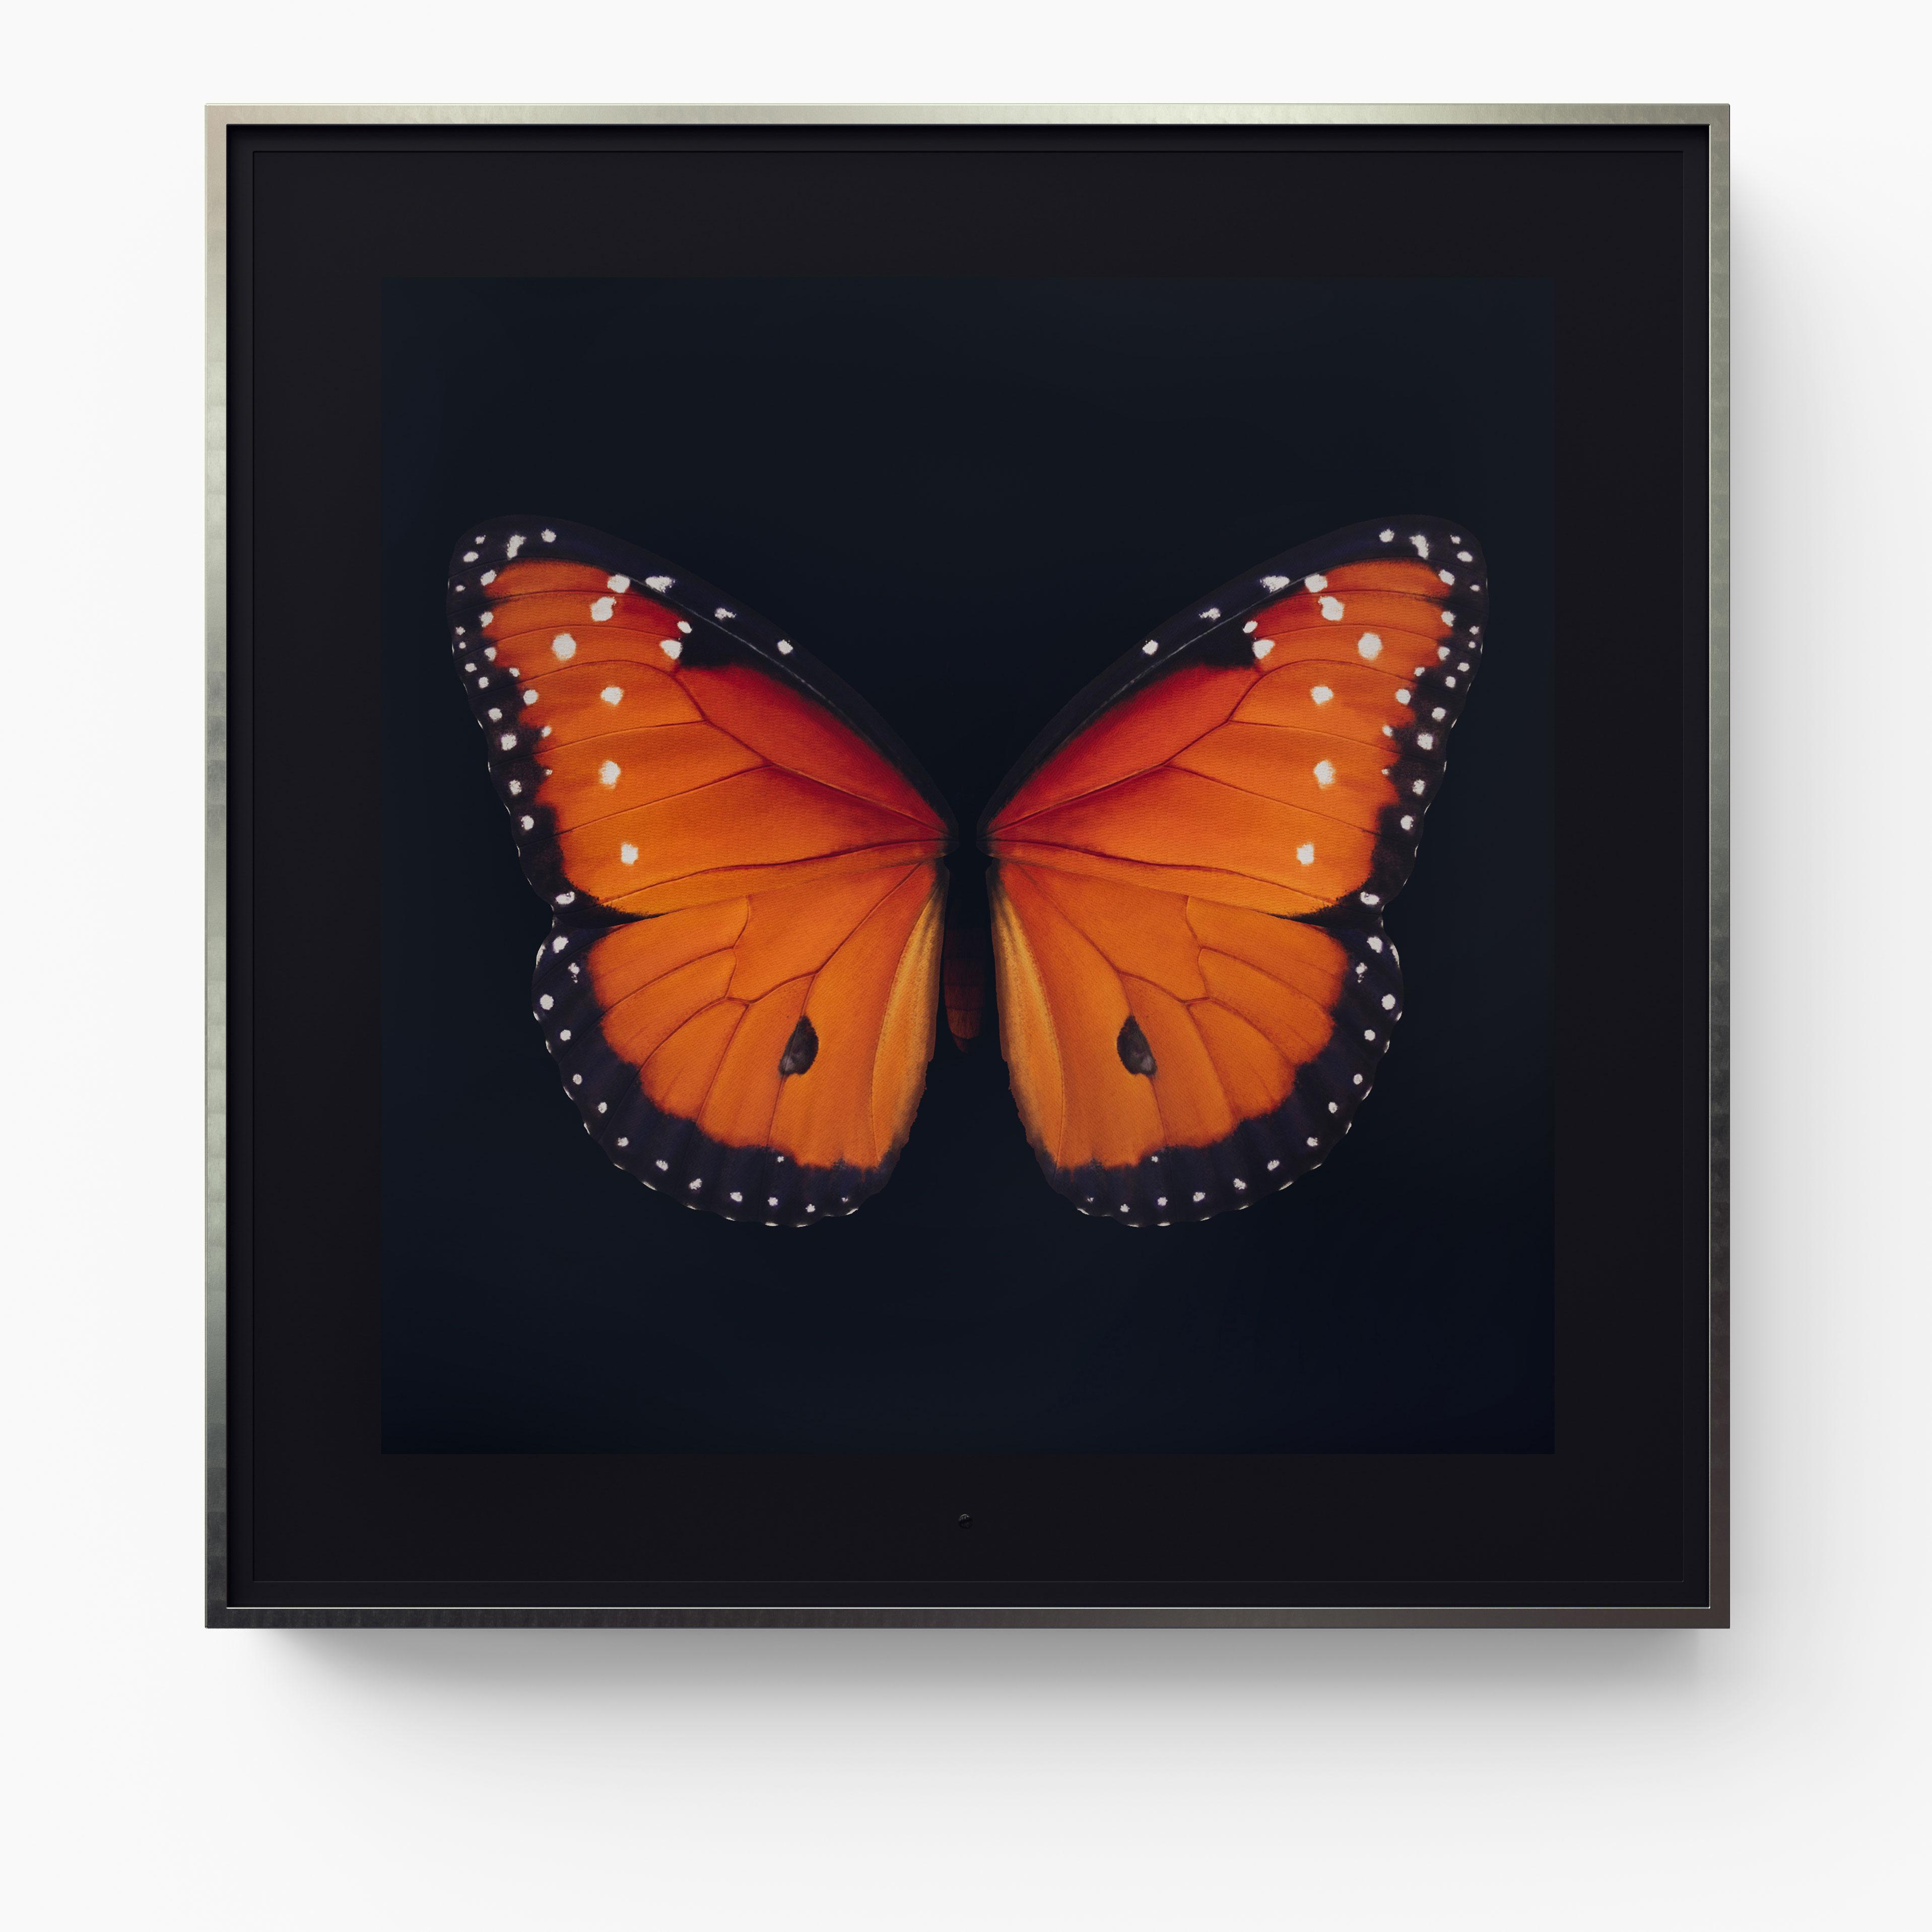 Metamorphosis: Solo - Queen Butterfly